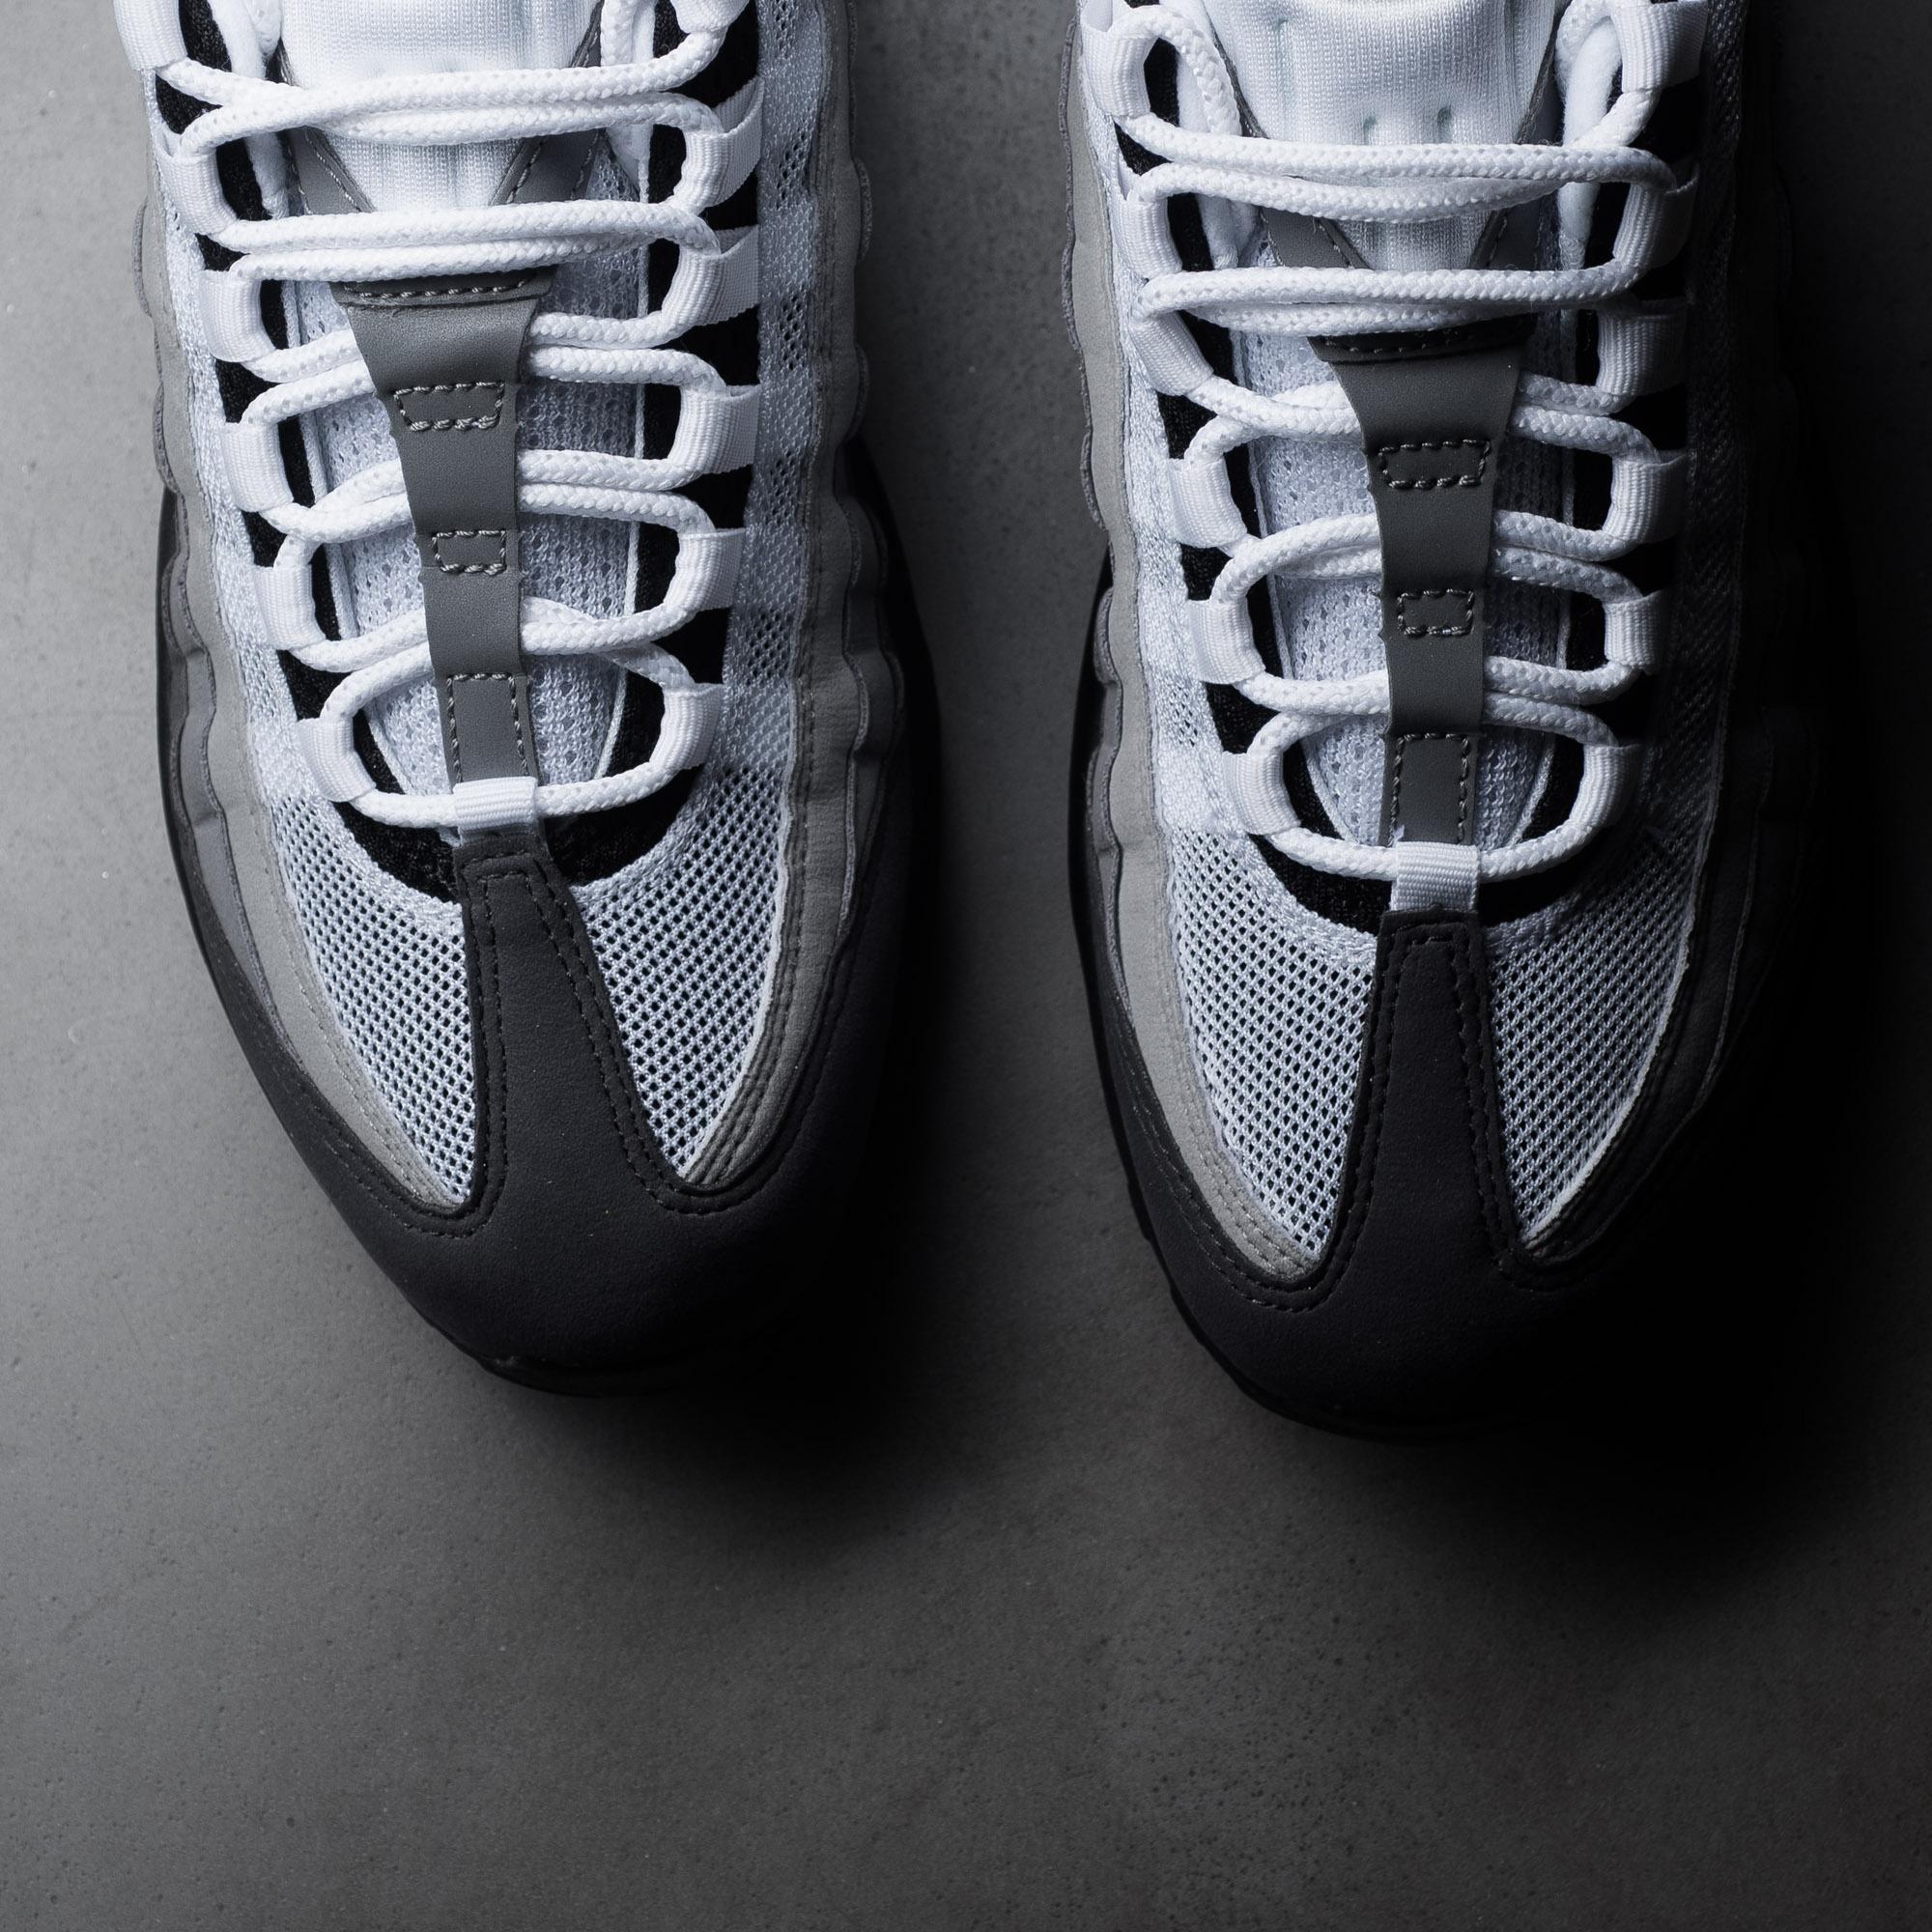 Nike Air Max 95 Og Goes Back To Basics Nice Kicks